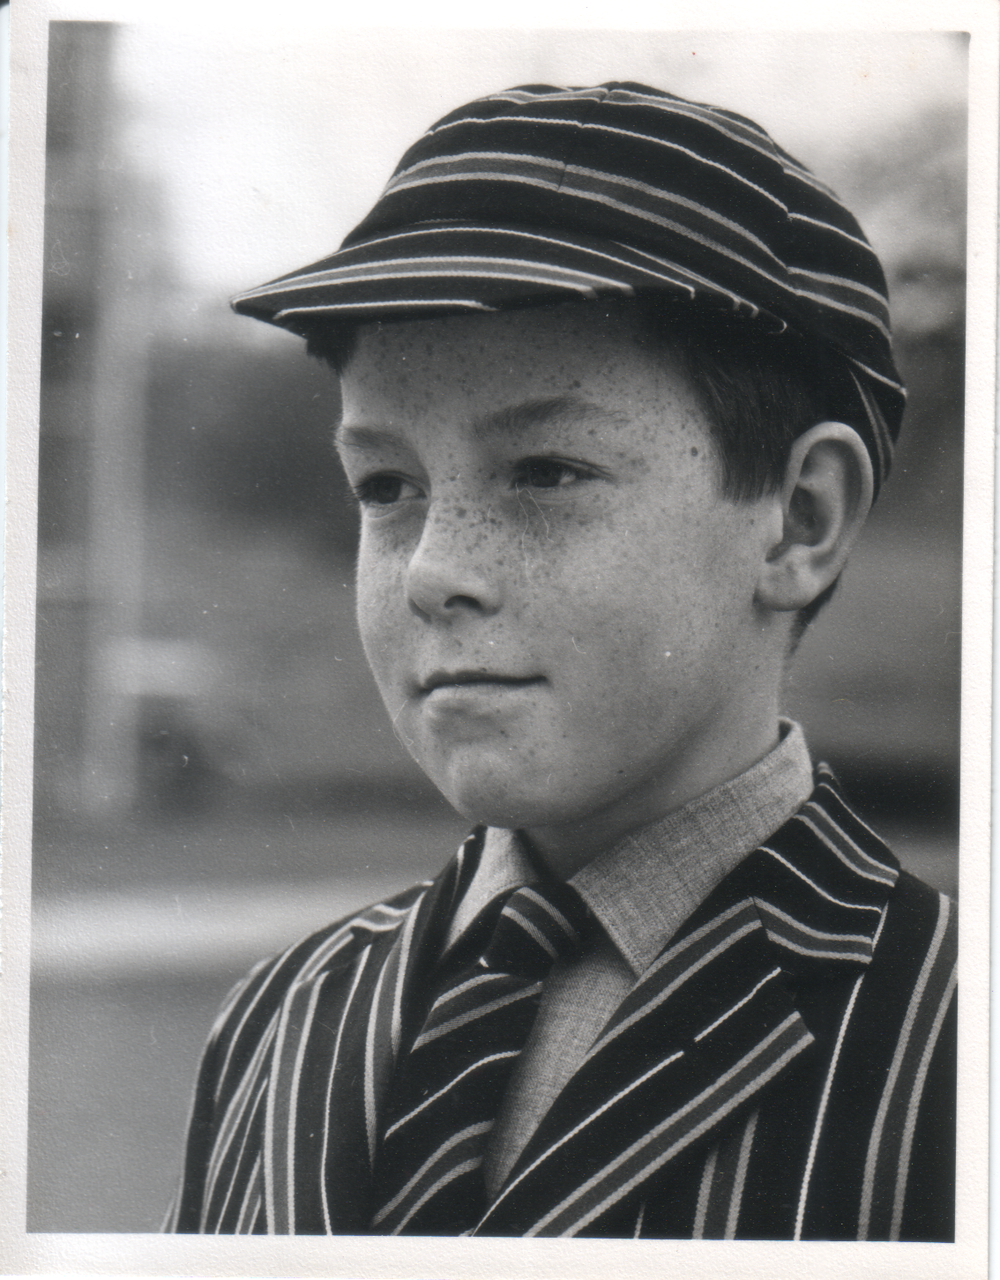 CCA in Grenville College school uniform in 1962, Age 10.